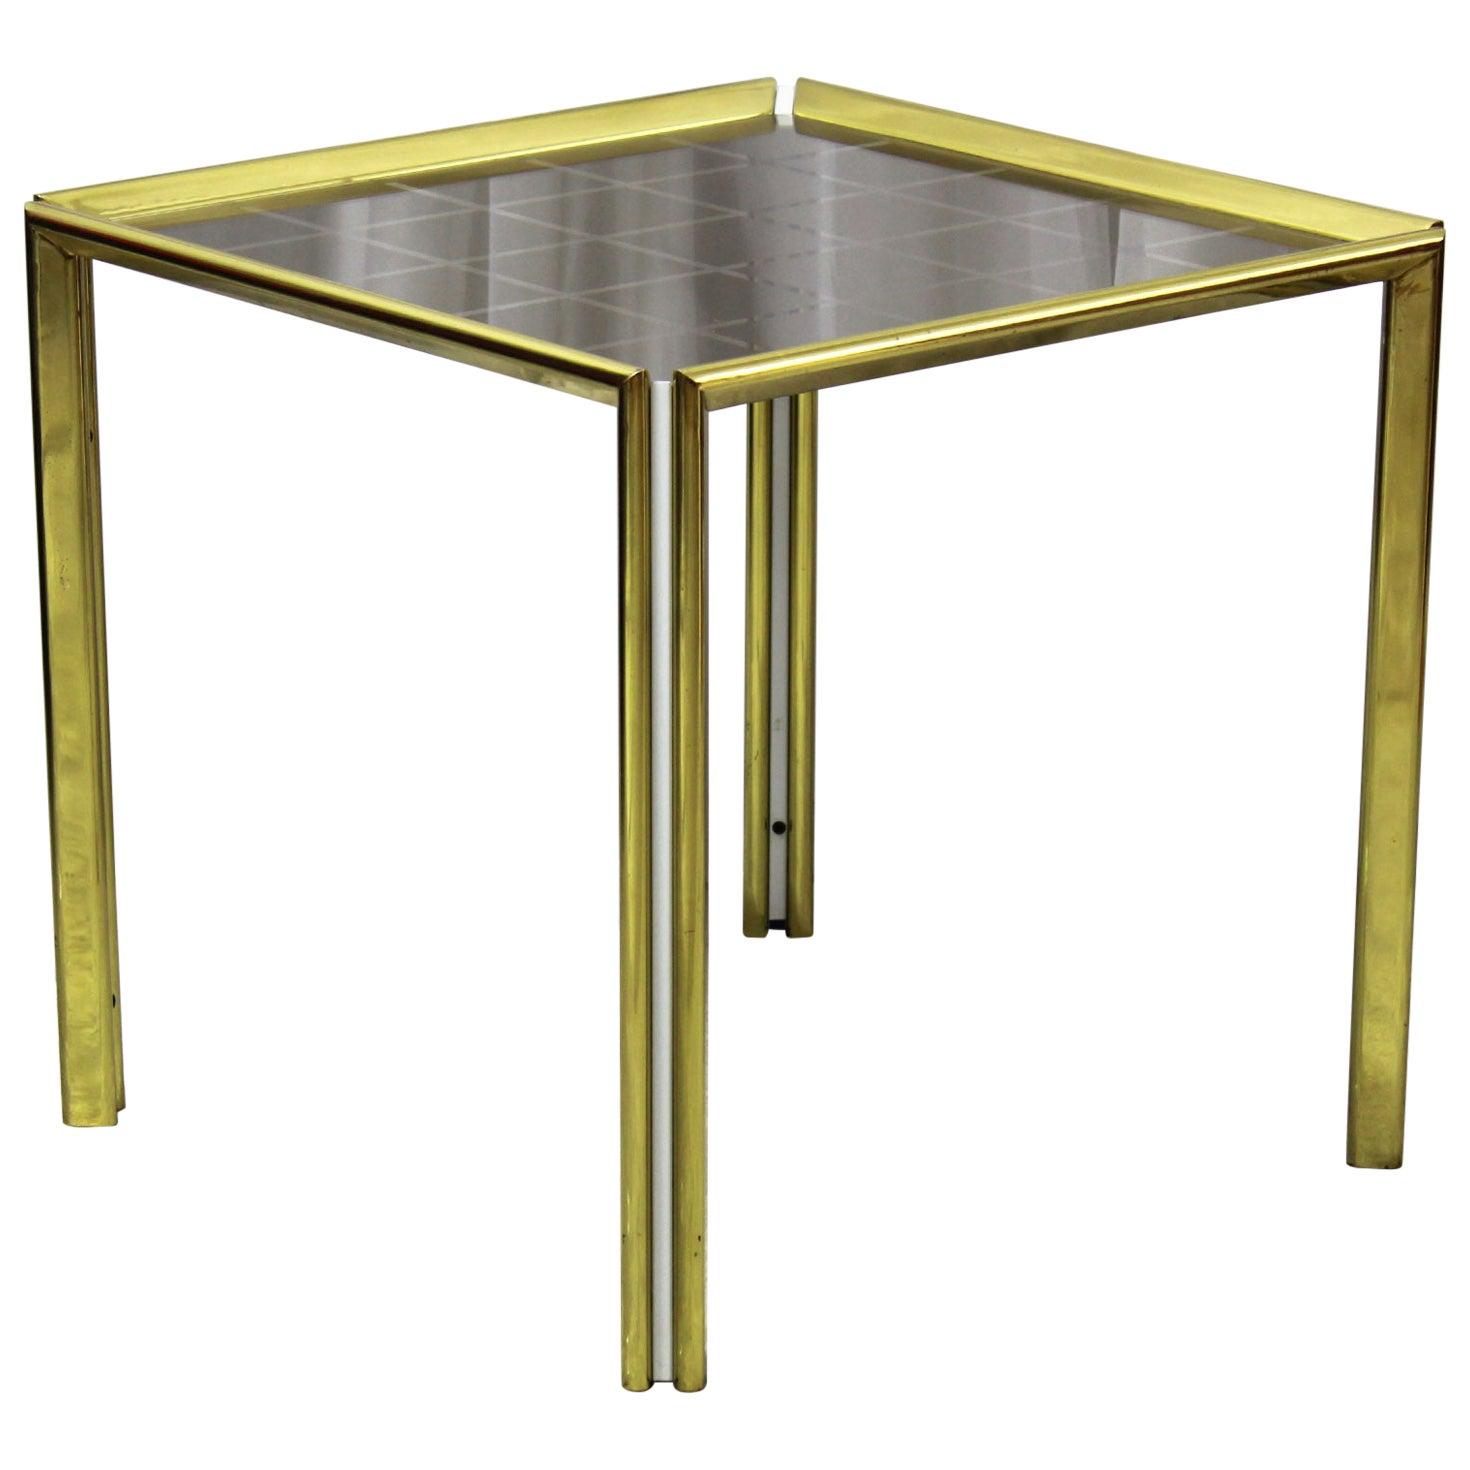 Italian Vintage Golden ROD Coffee Table, 1970s